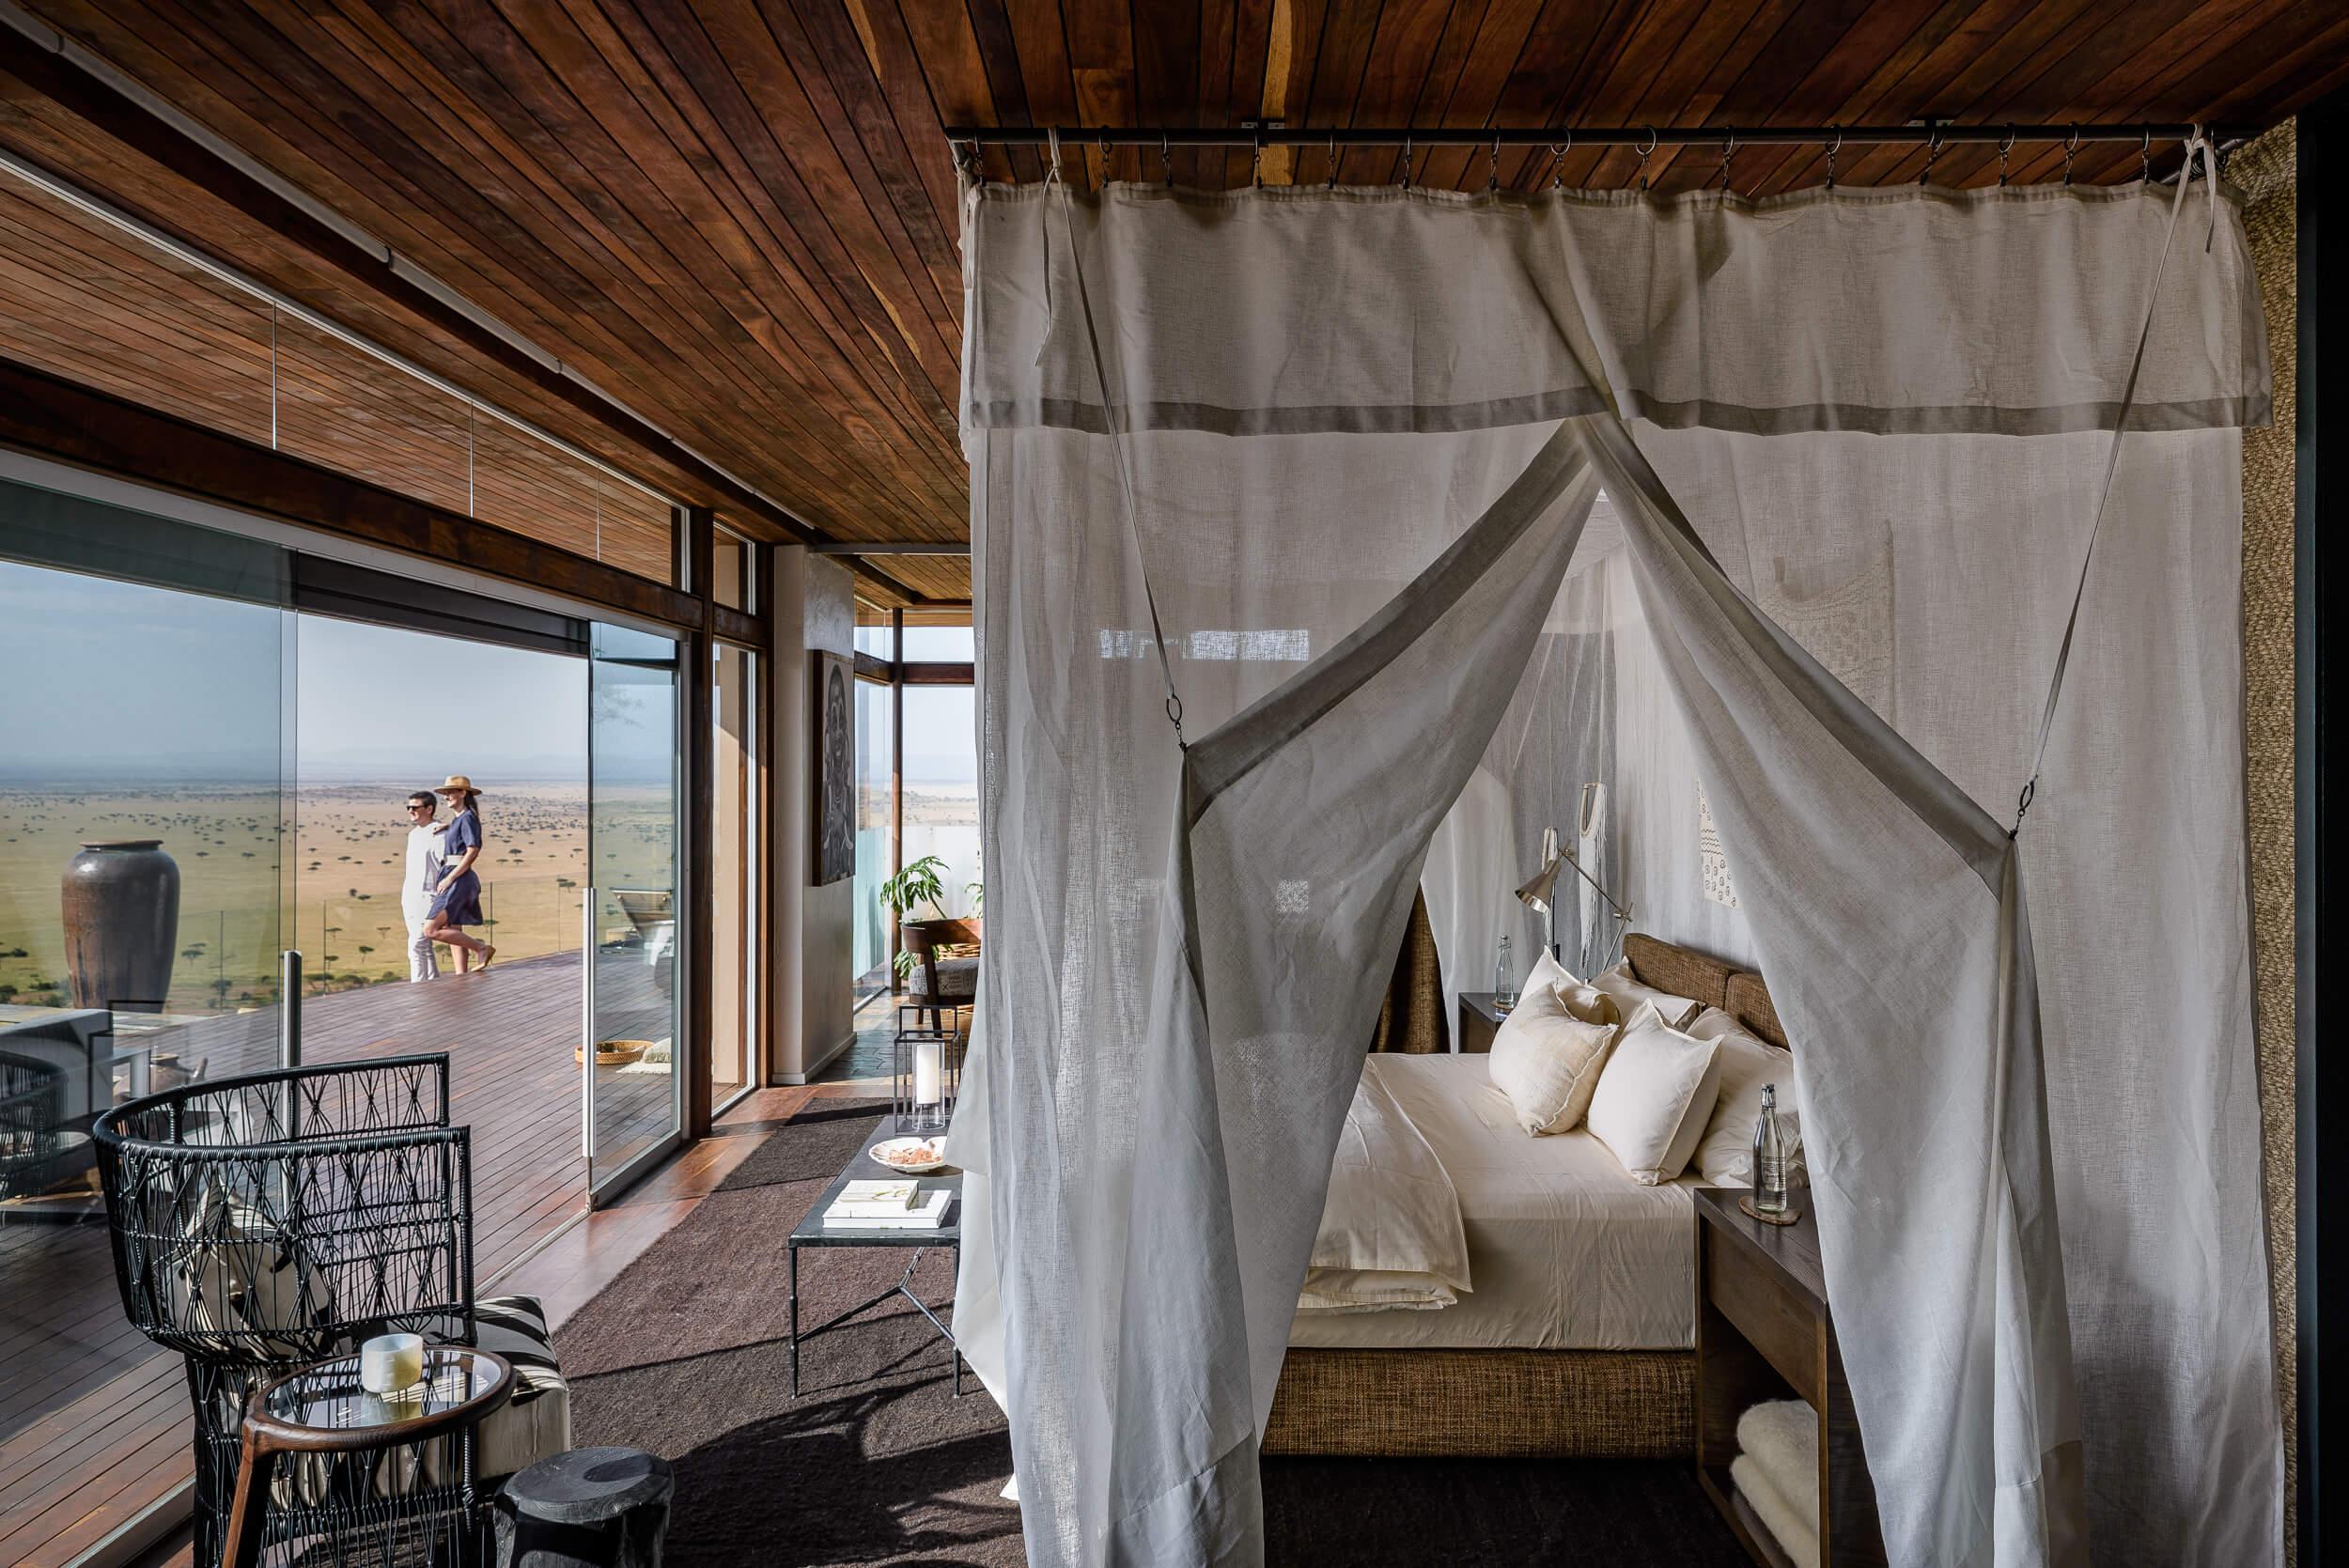 Hillside-Suite-Singita-Sasakwa-Lodge-Bedroom-and-Deck.jpg